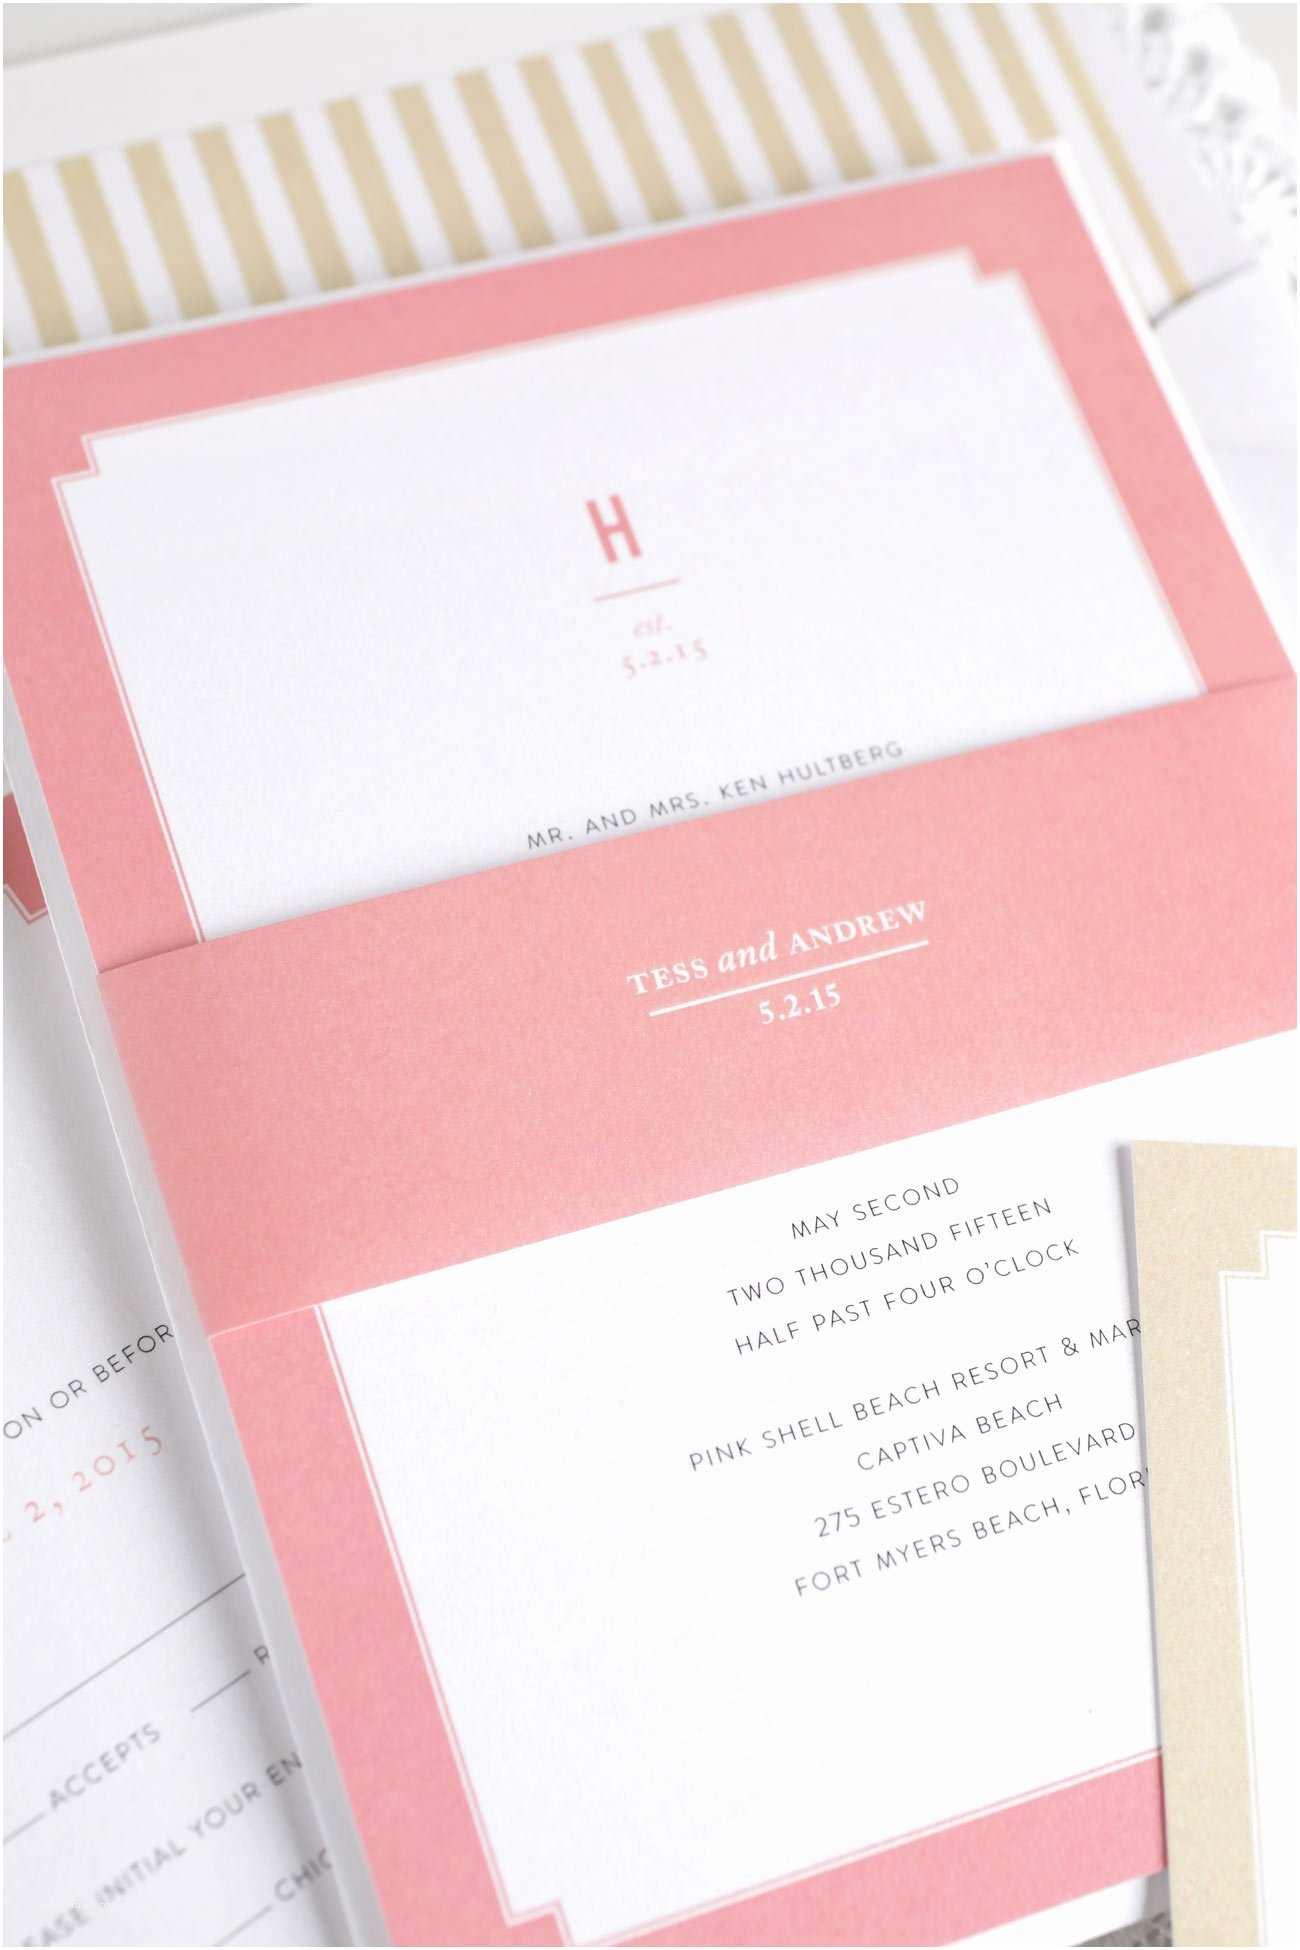 Pink and Gold Wedding Invitations Monogram Wedding Invitations In Coral and Gold – Wedding